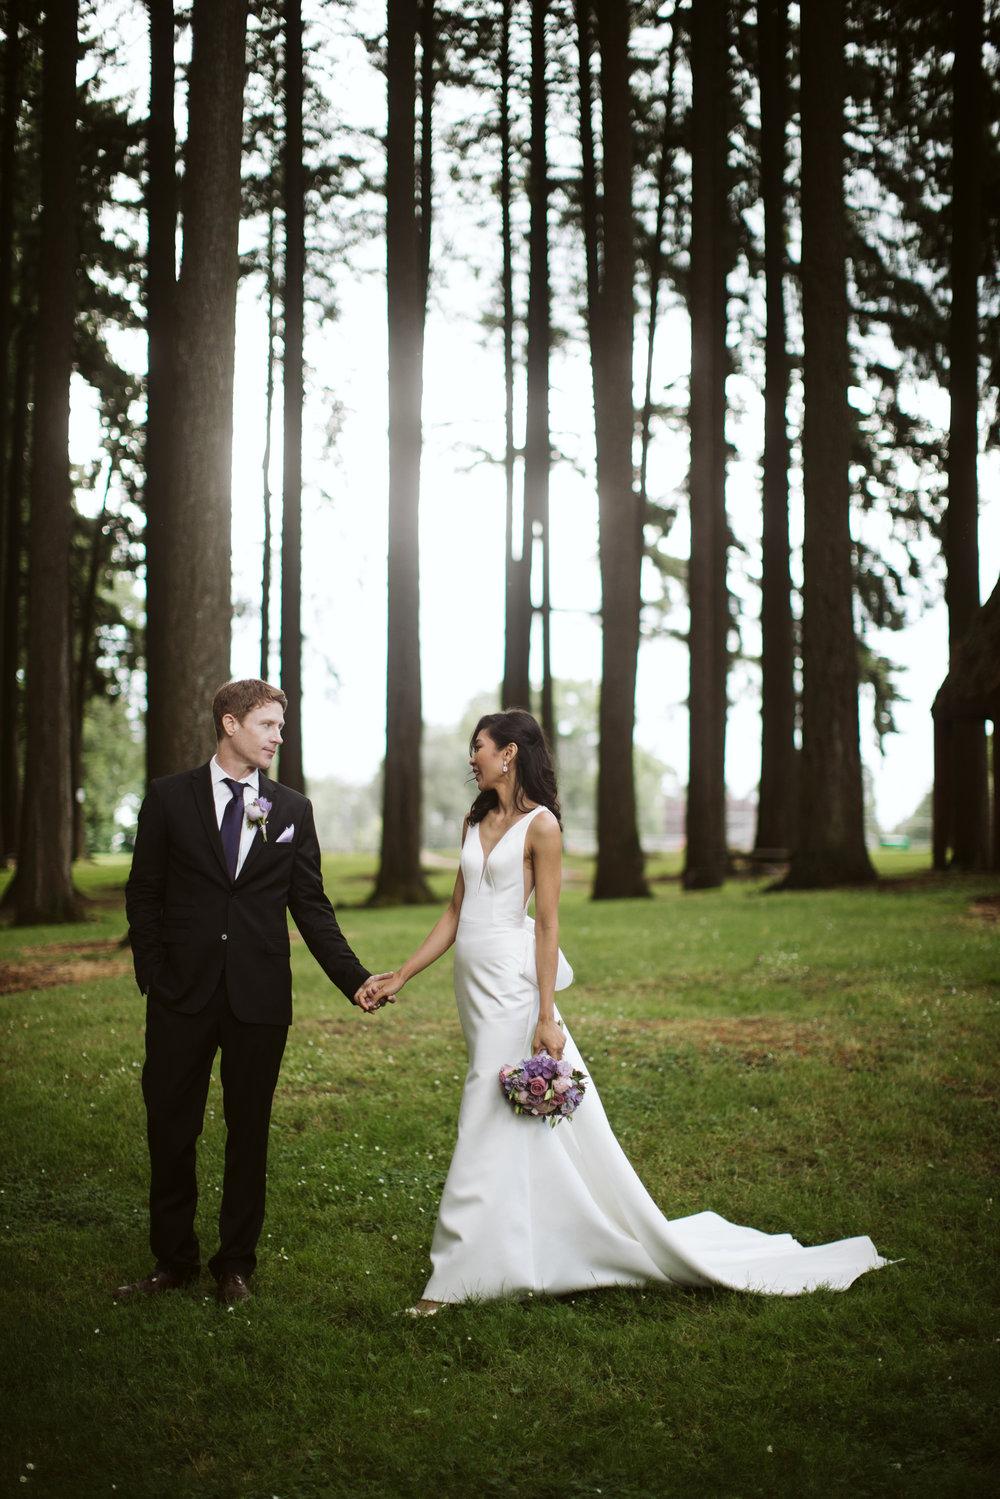 052-daronjackson-jason-picha-wedding.jpg